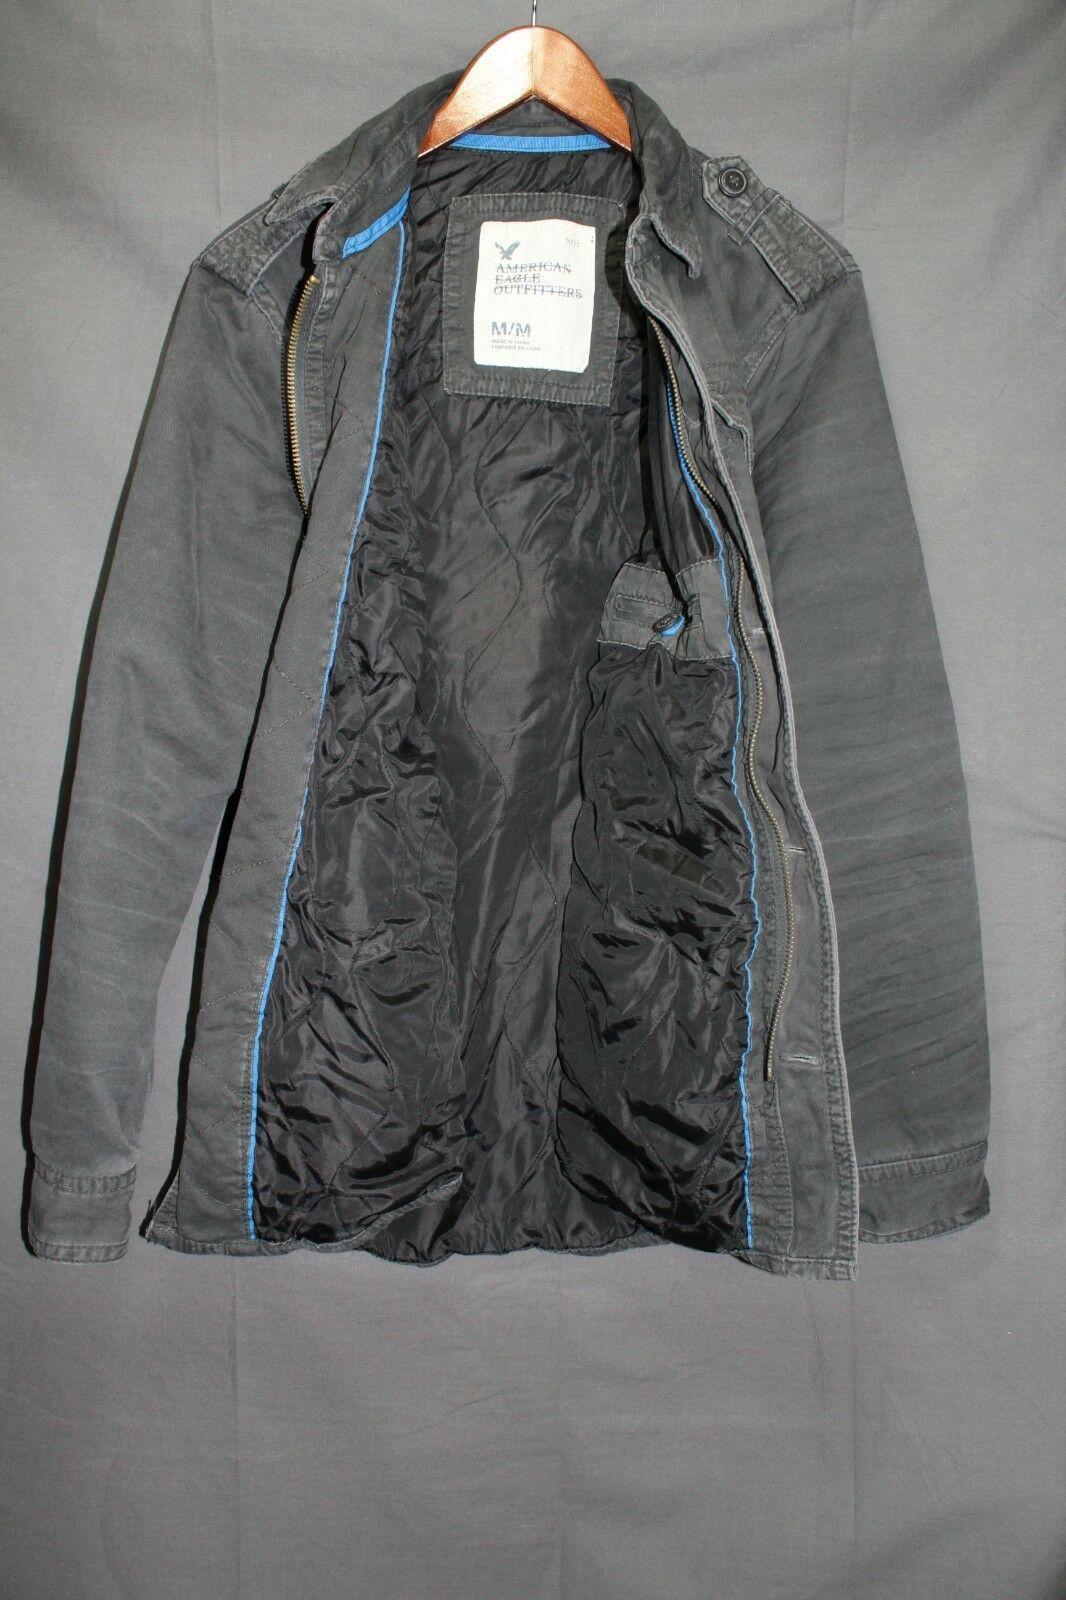 NEW Men's AE Military Field Coat Lined Shirt Jacket Twill Grey M - $99.95